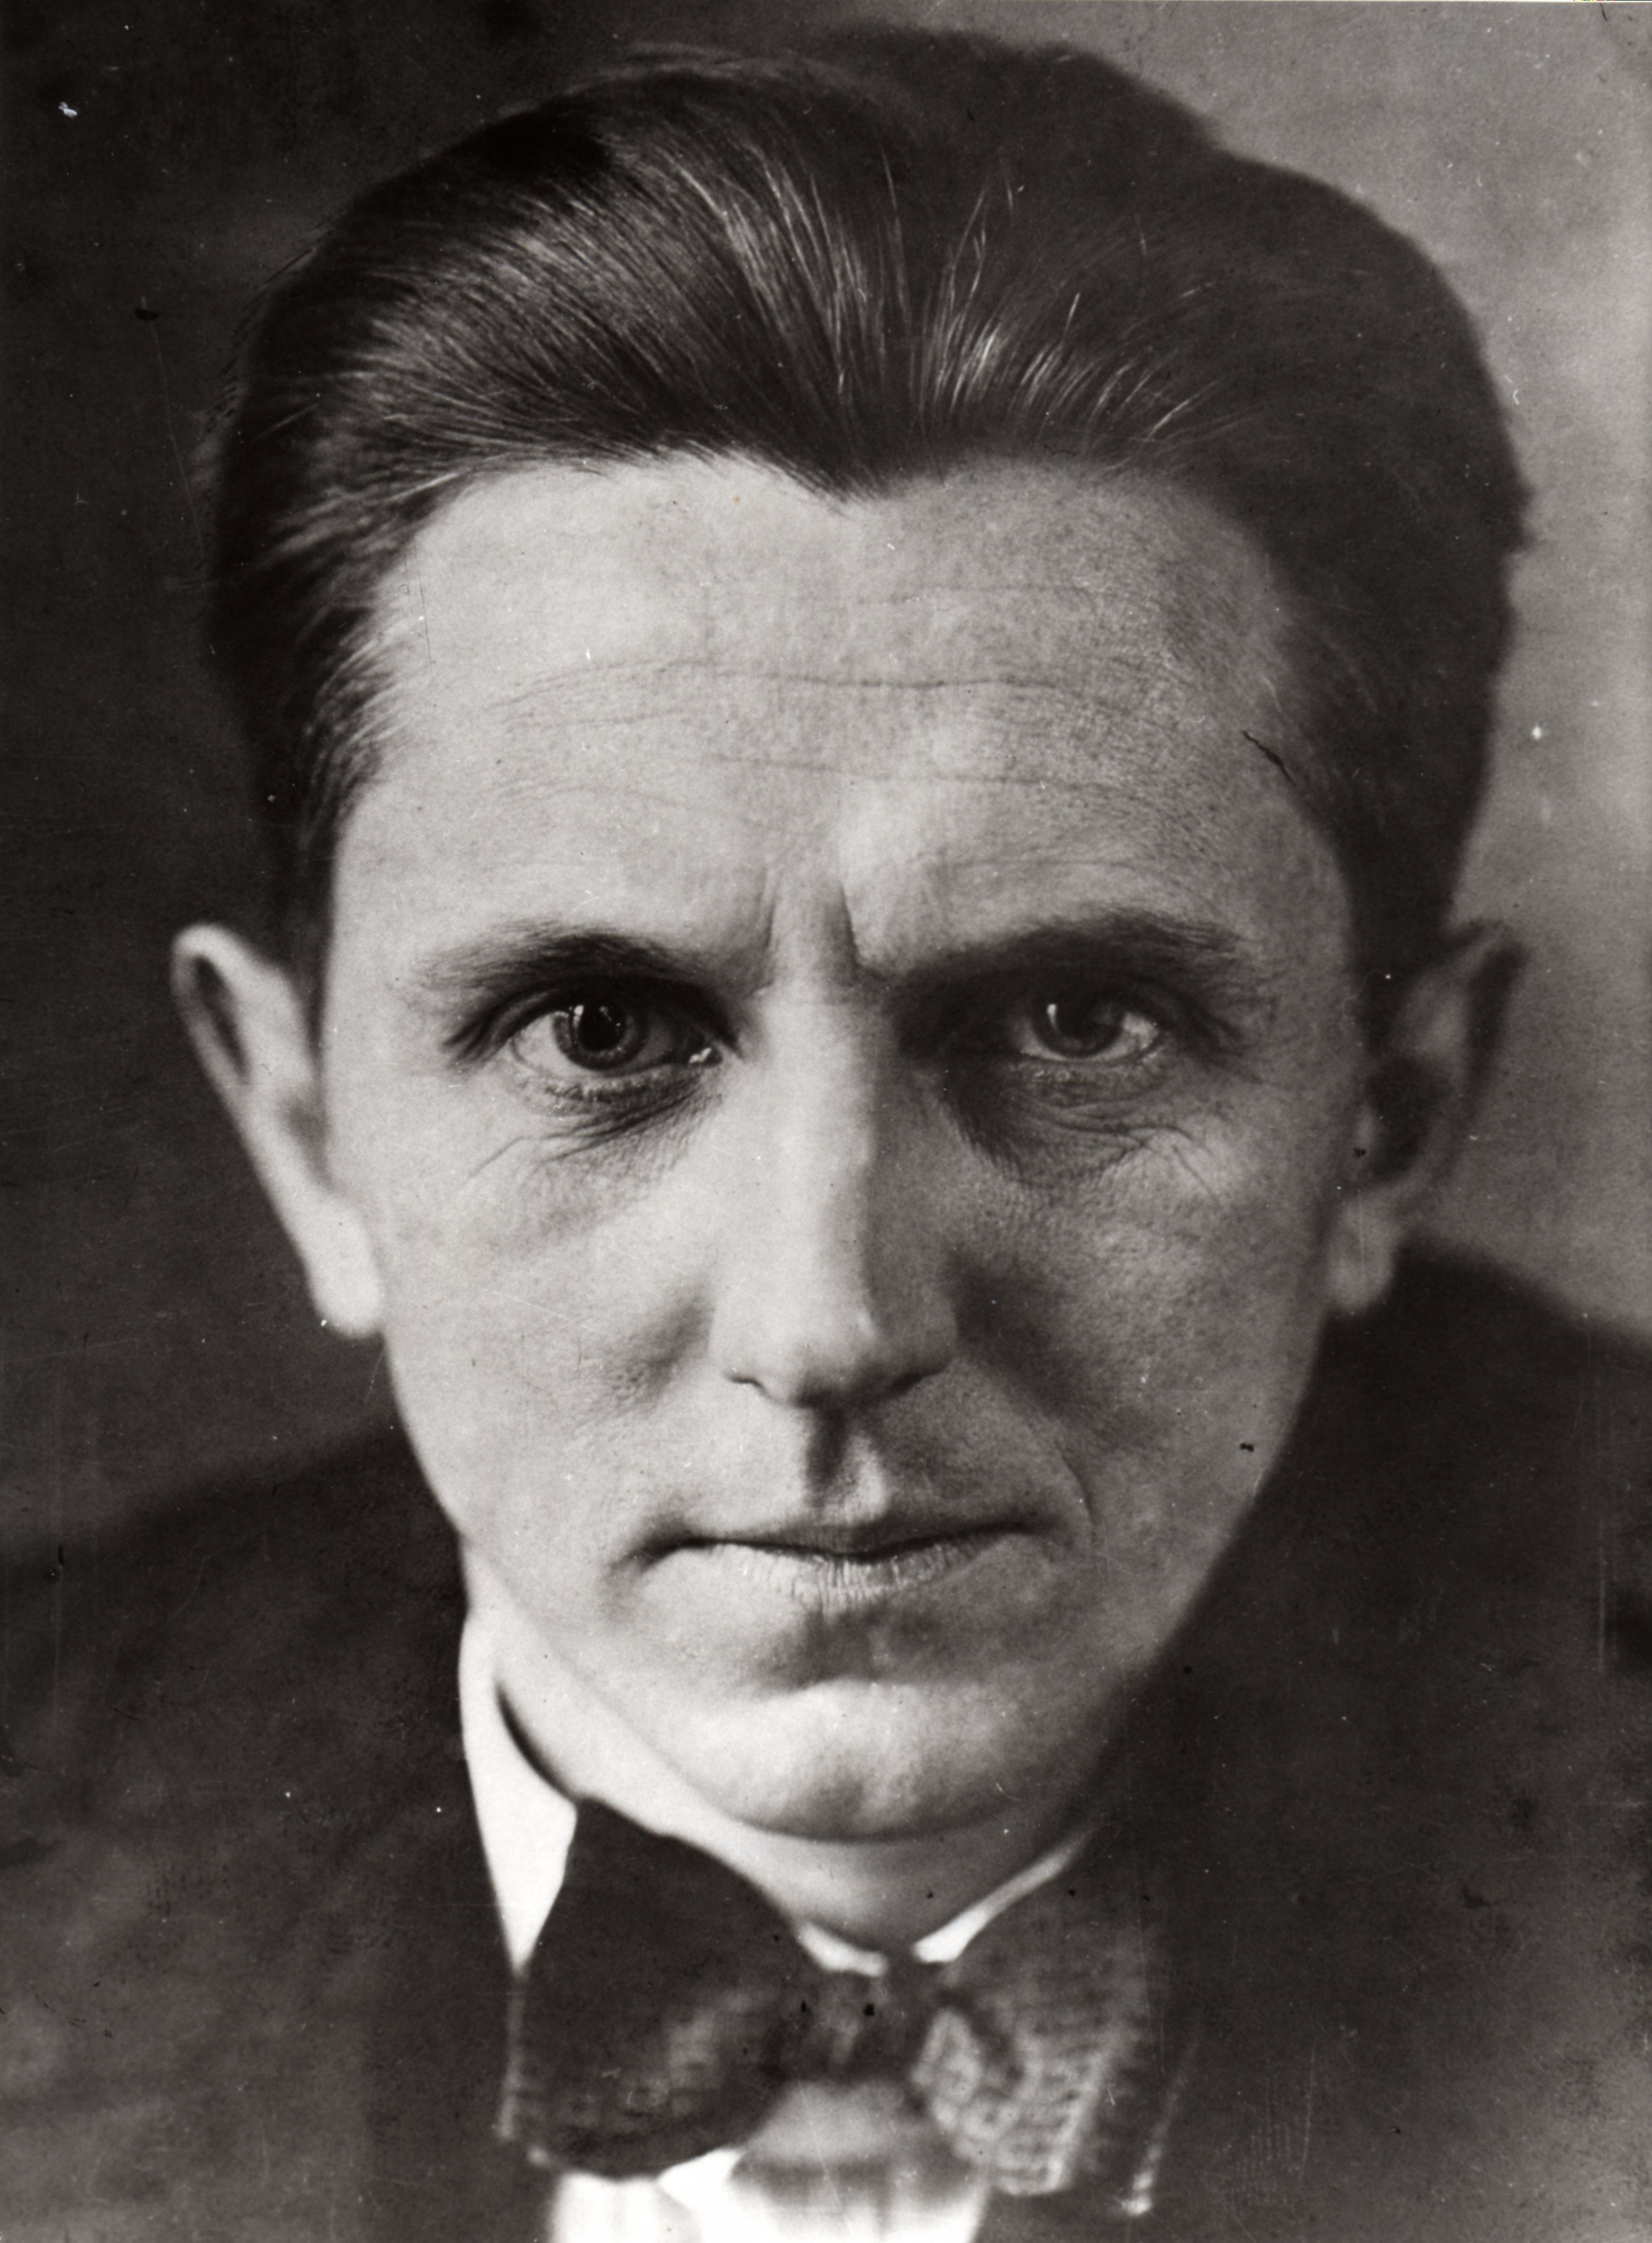 Erwin Piscator, circa 1927